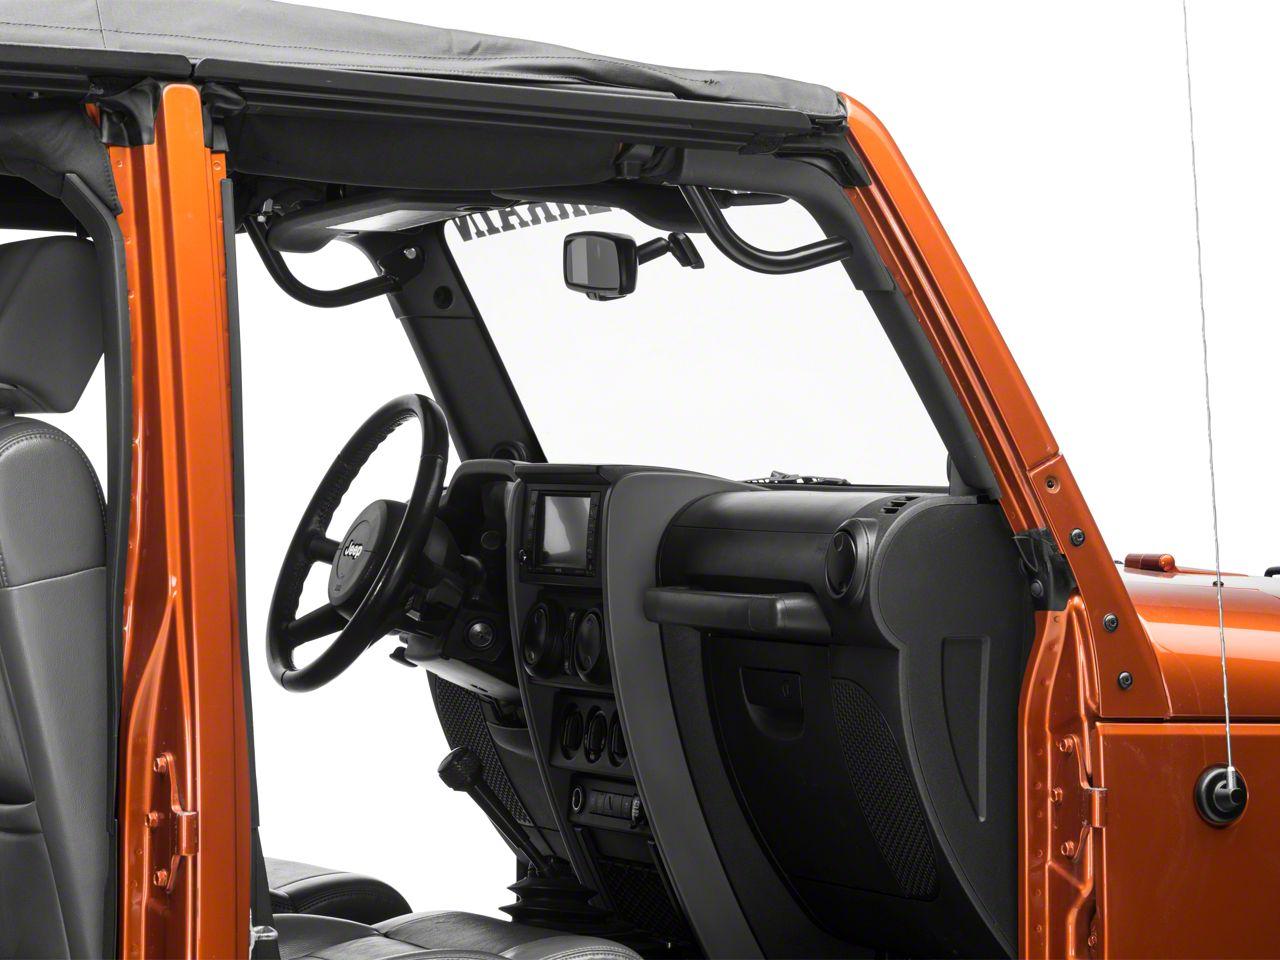 Synergy Front Grab Handles (07-18 Jeep Wrangler JK; 2018 Jeep Wrangler JL)